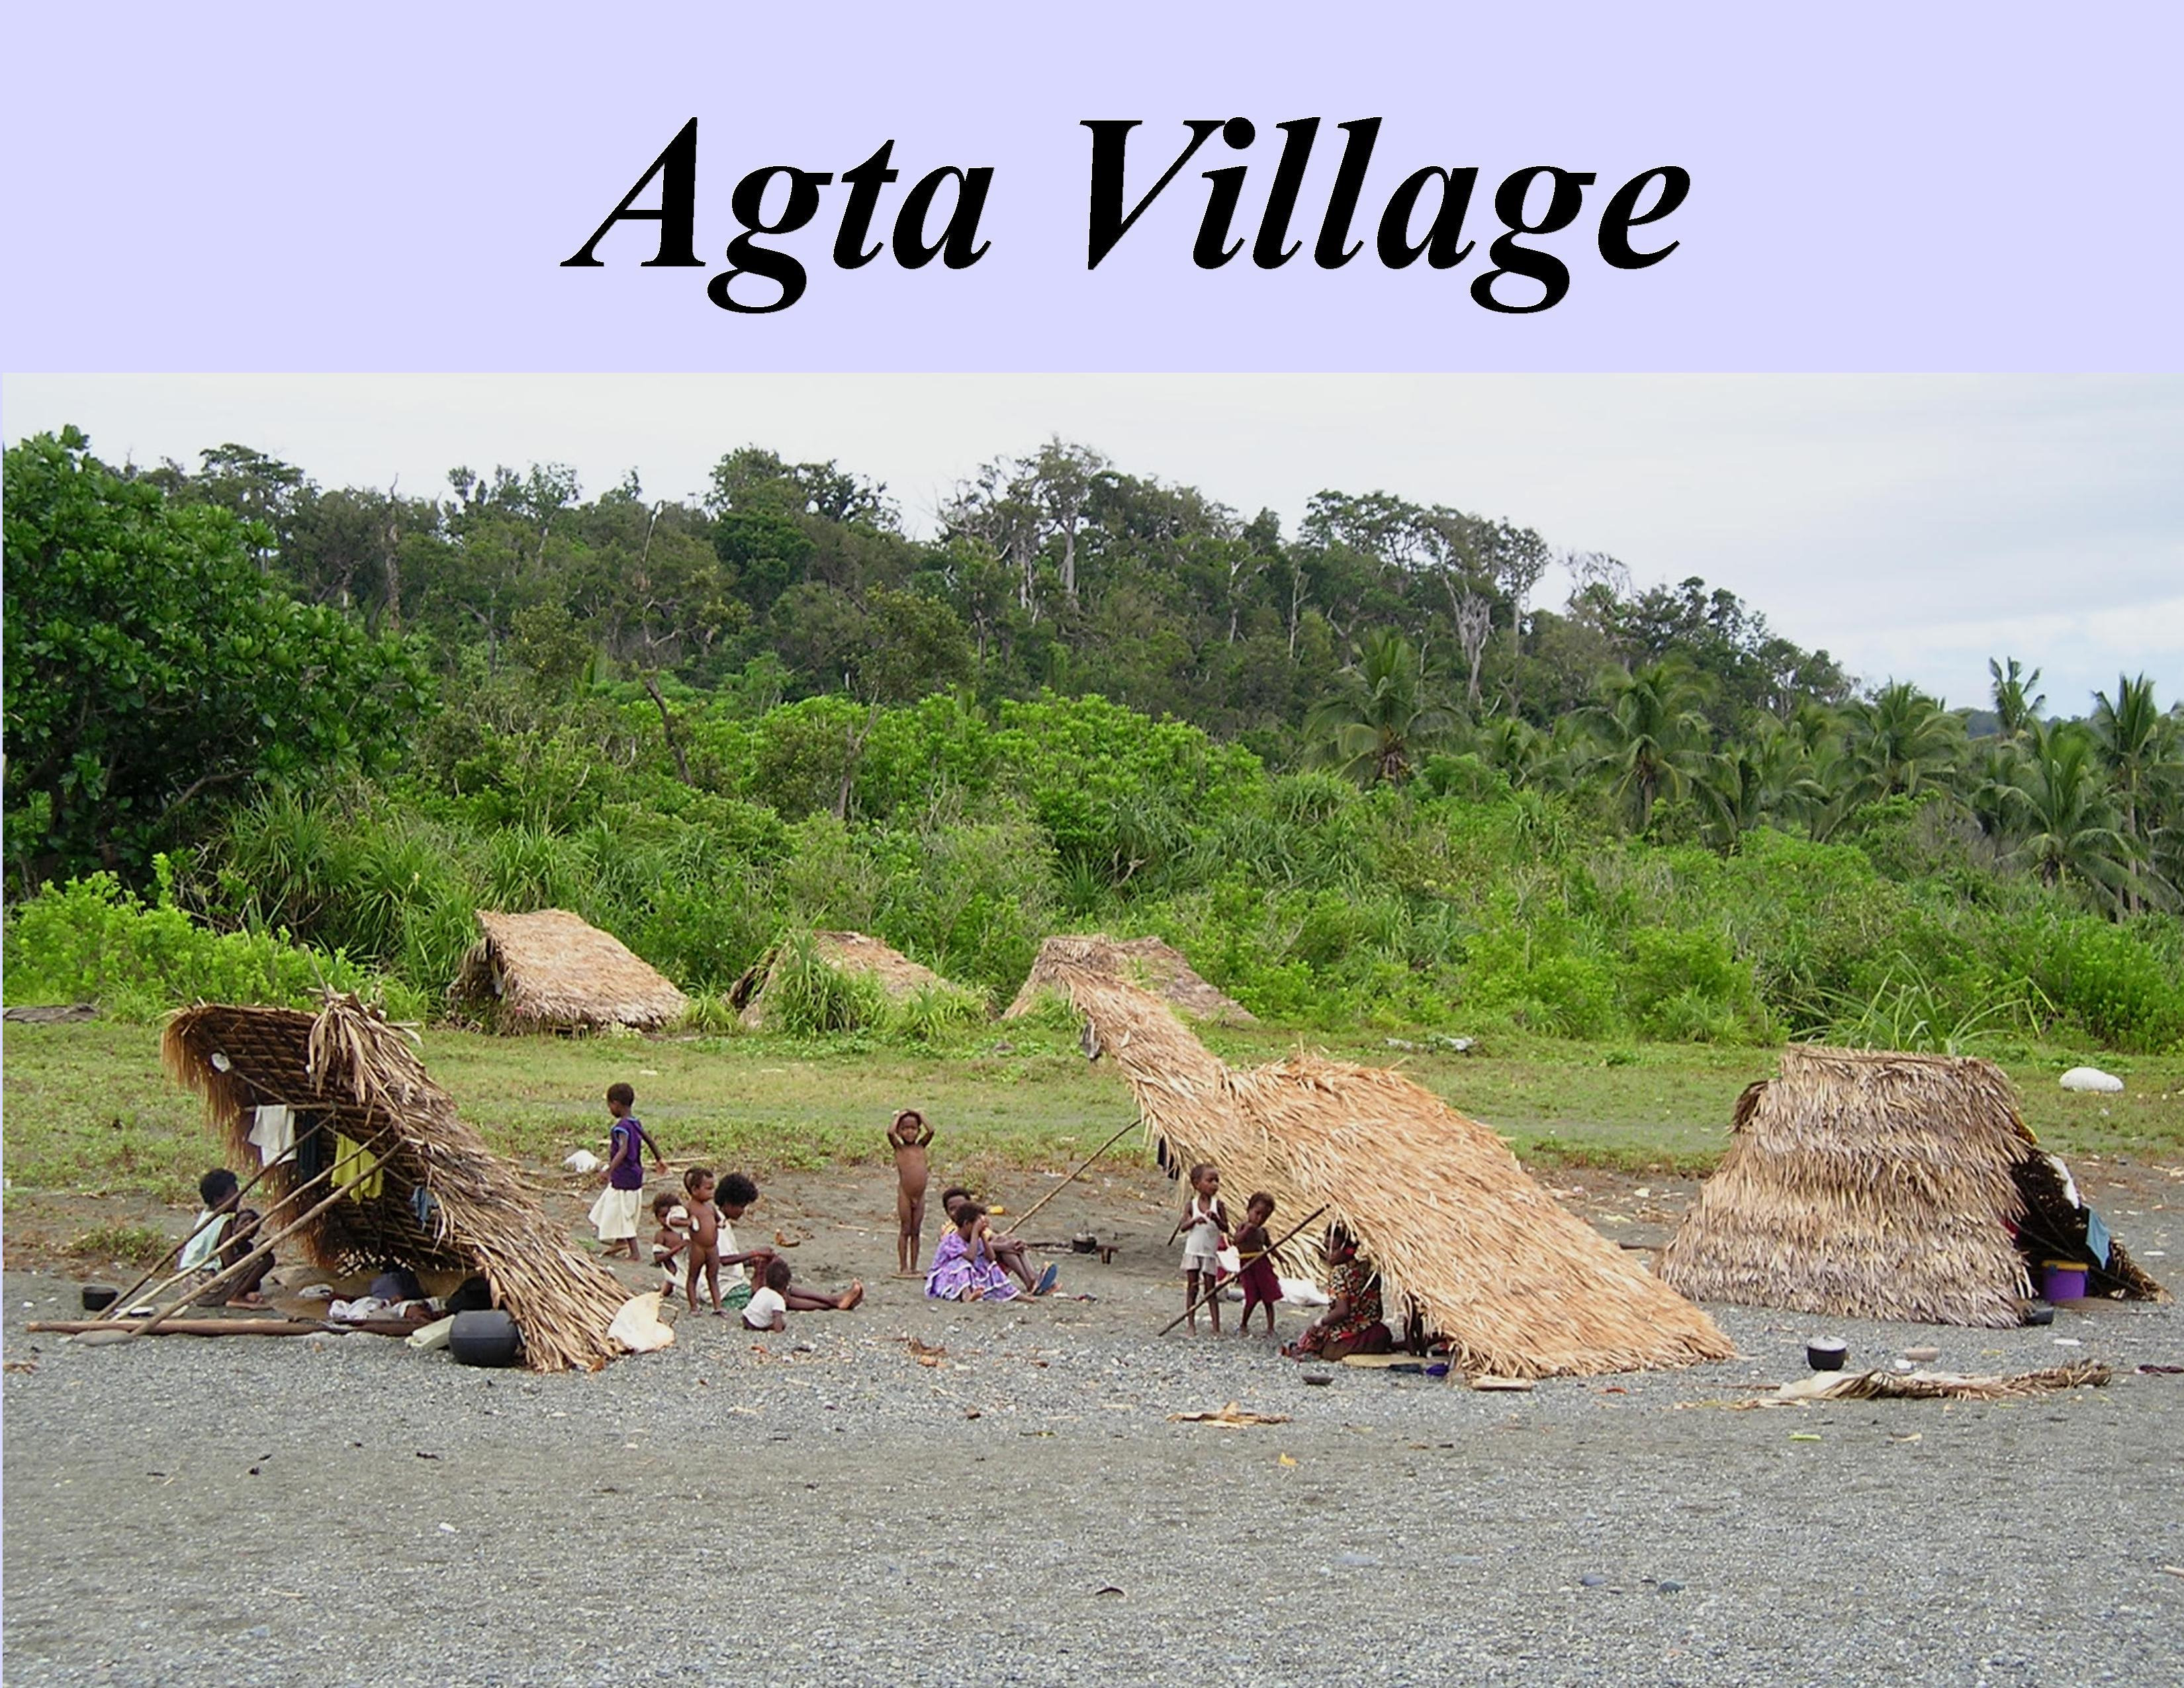 Agta-Village-1.jpg